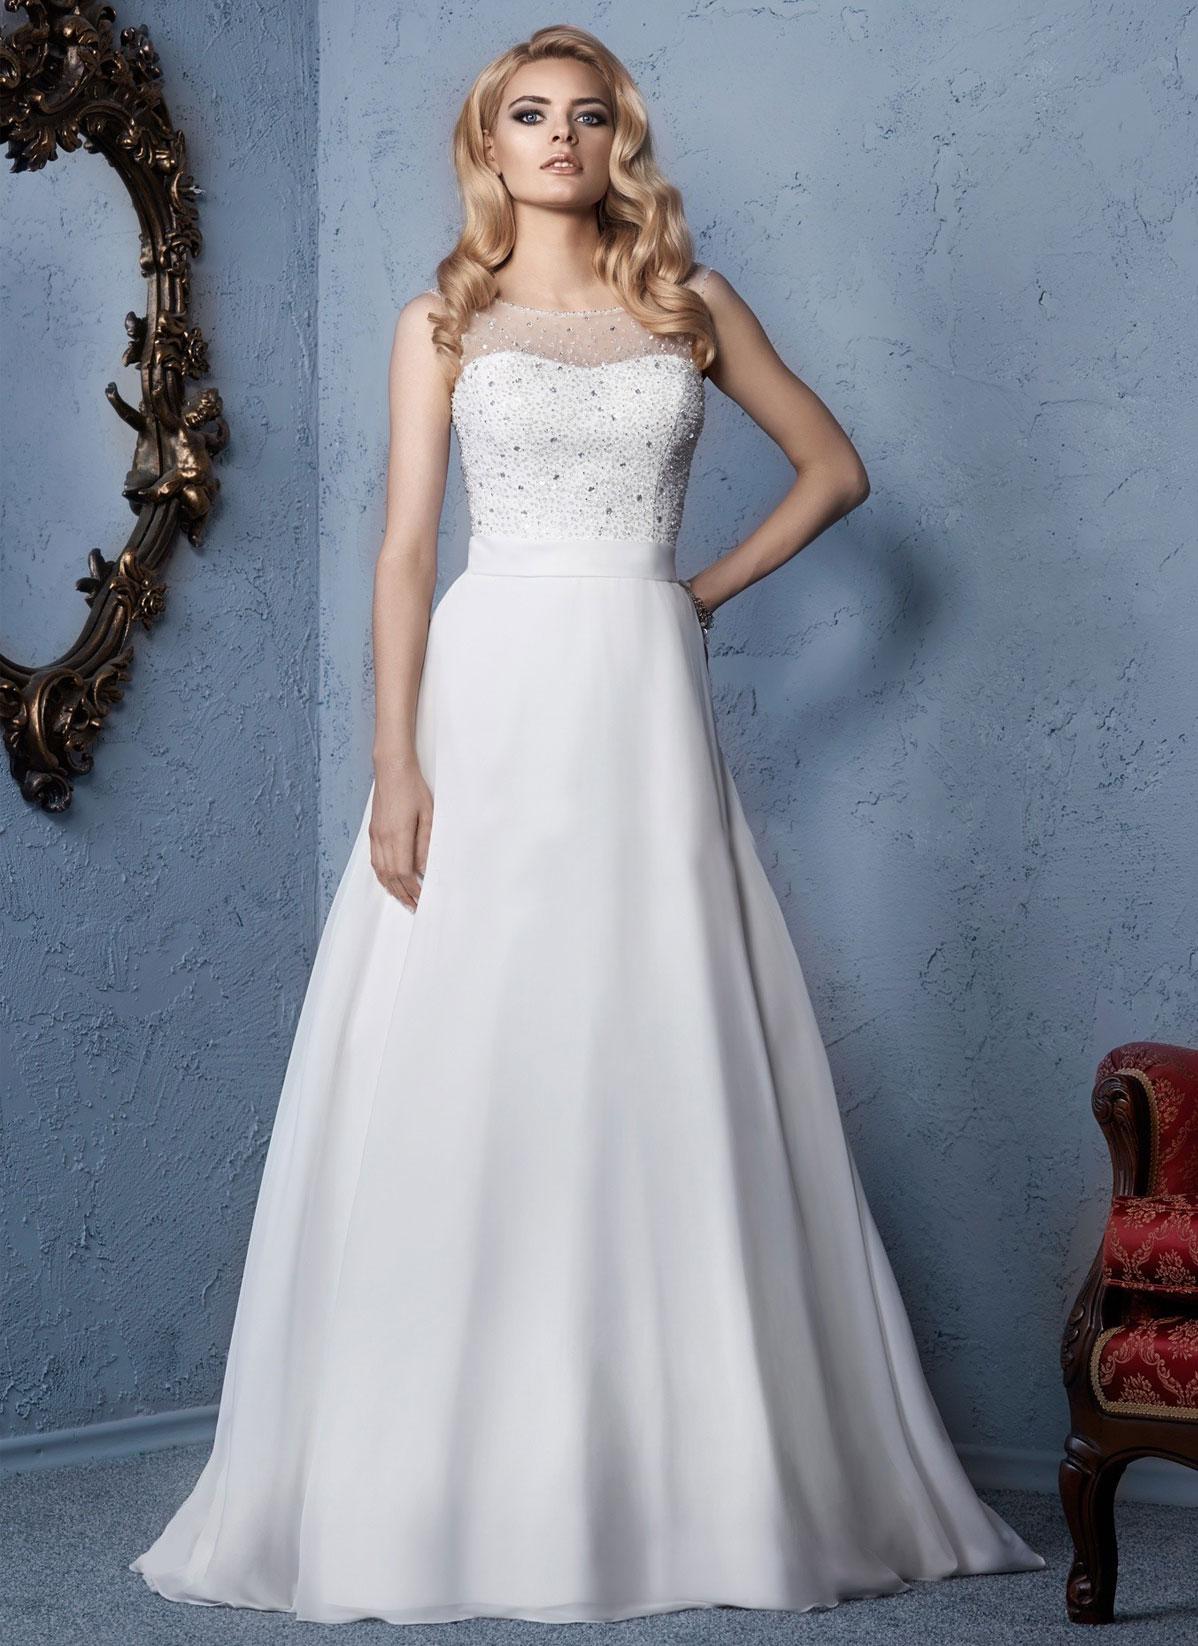 Herm&#8217;s Bridal <br> Lamoni